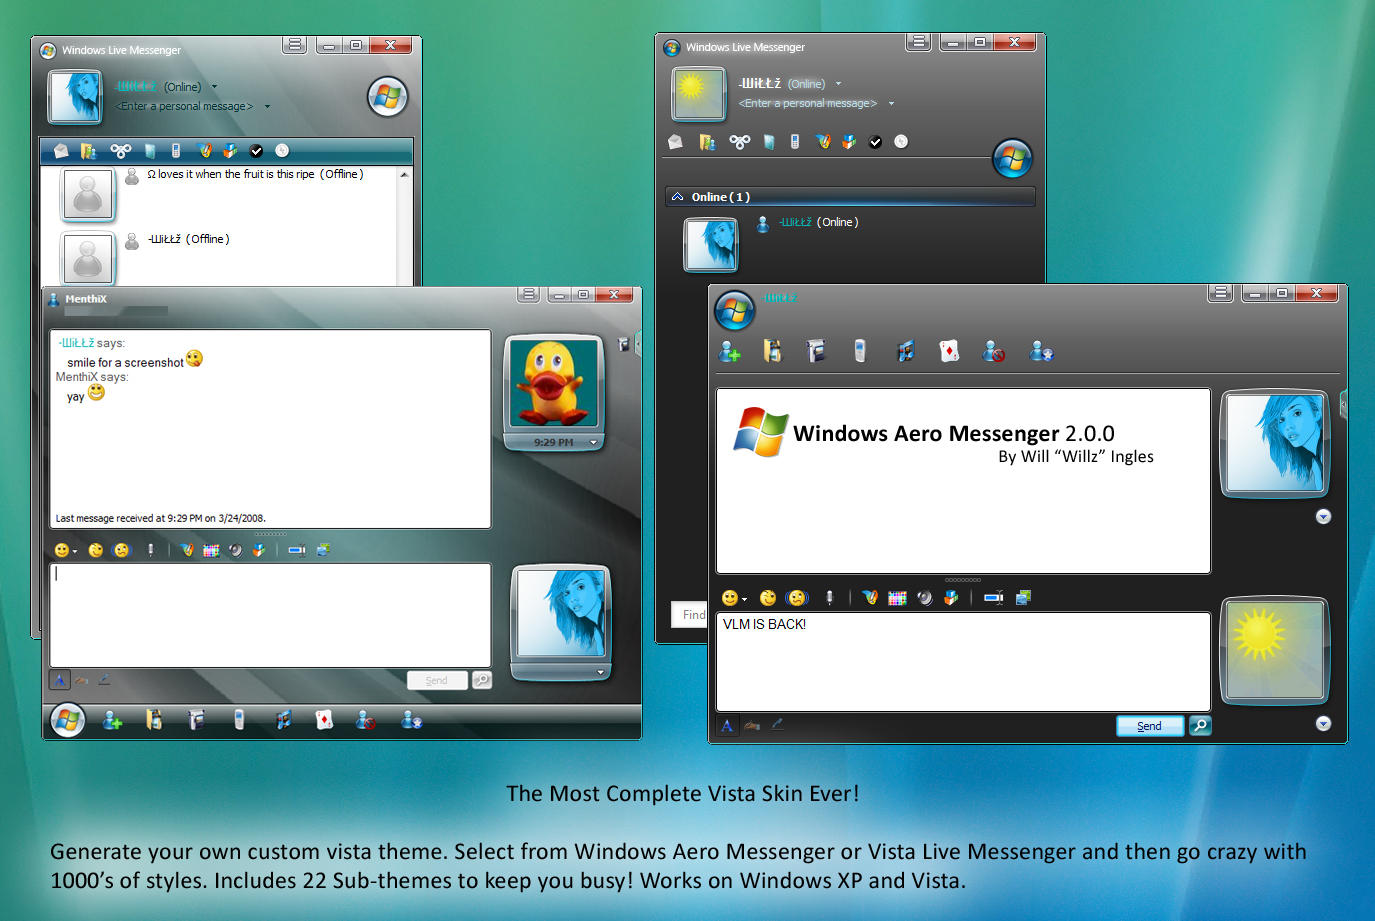 Window live messenger for windows xp.